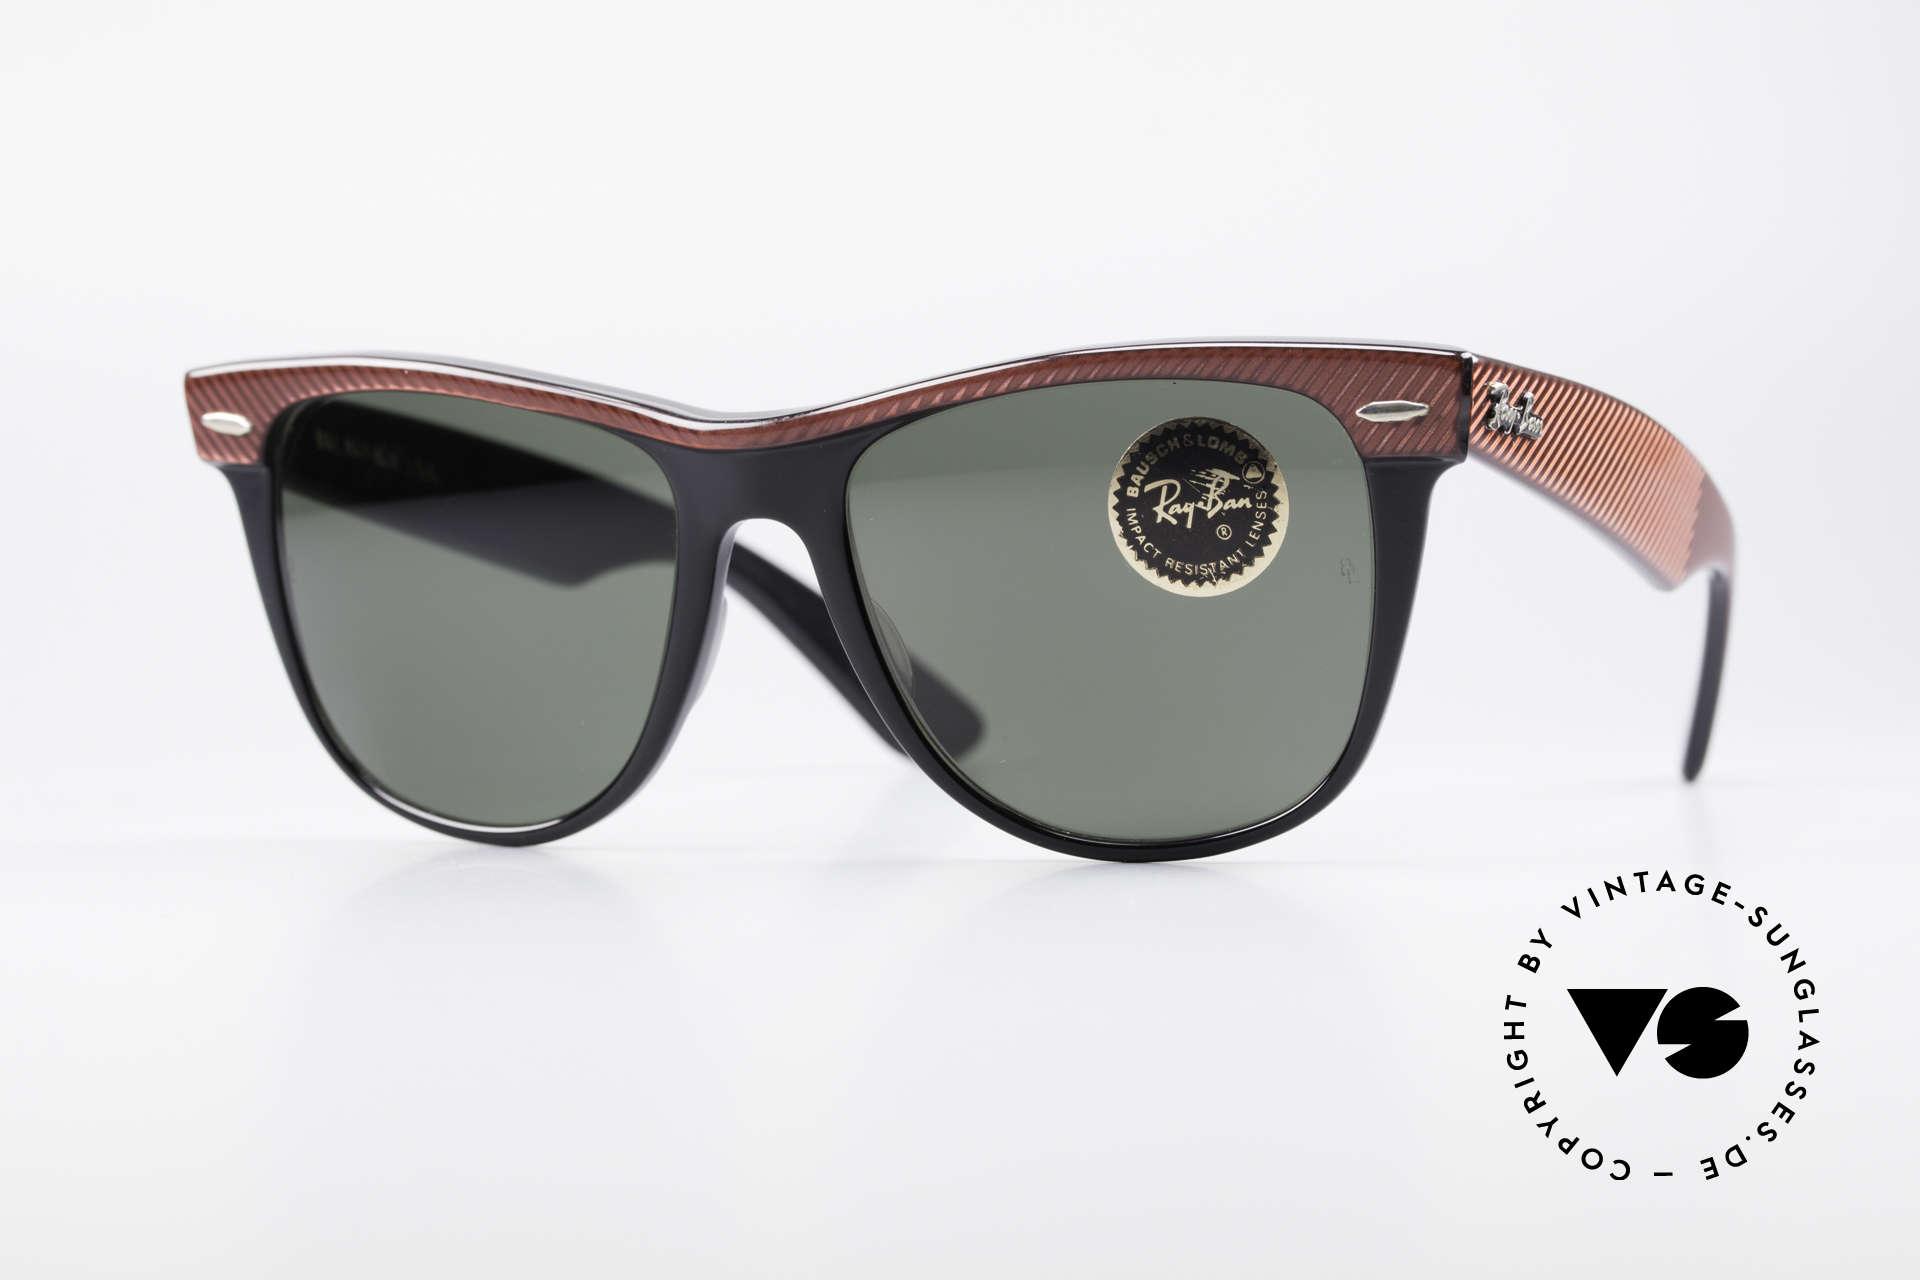 Ray Ban Wayfarer II Original USA Wayfarer B&L, vintage Ray Ban Wayfarer sunglasses 'made in USA', Made for Men and Women